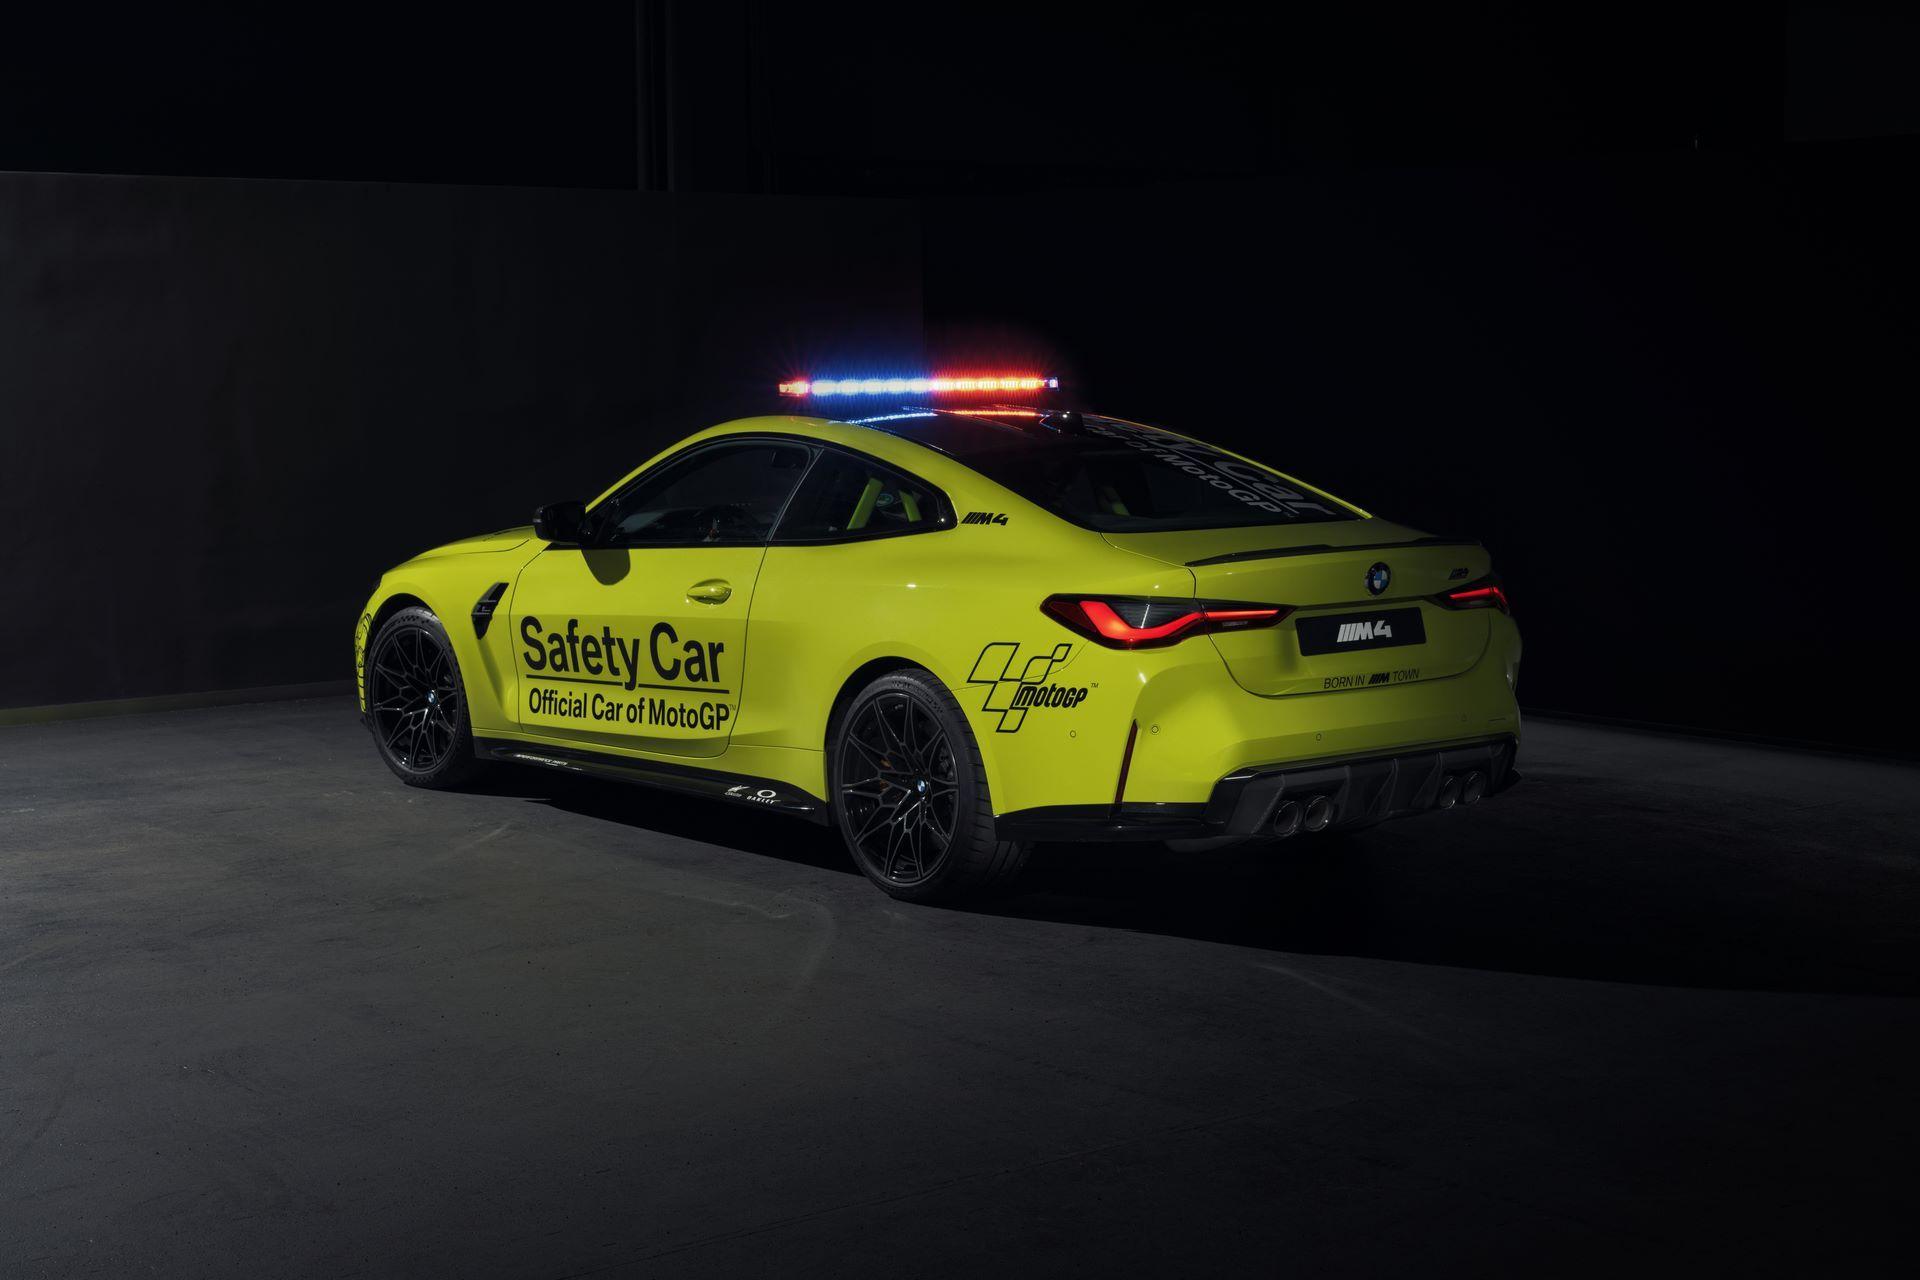 BMW-M3-M4-M5-CS-Safety-Cars-moto-gp-motogp-9